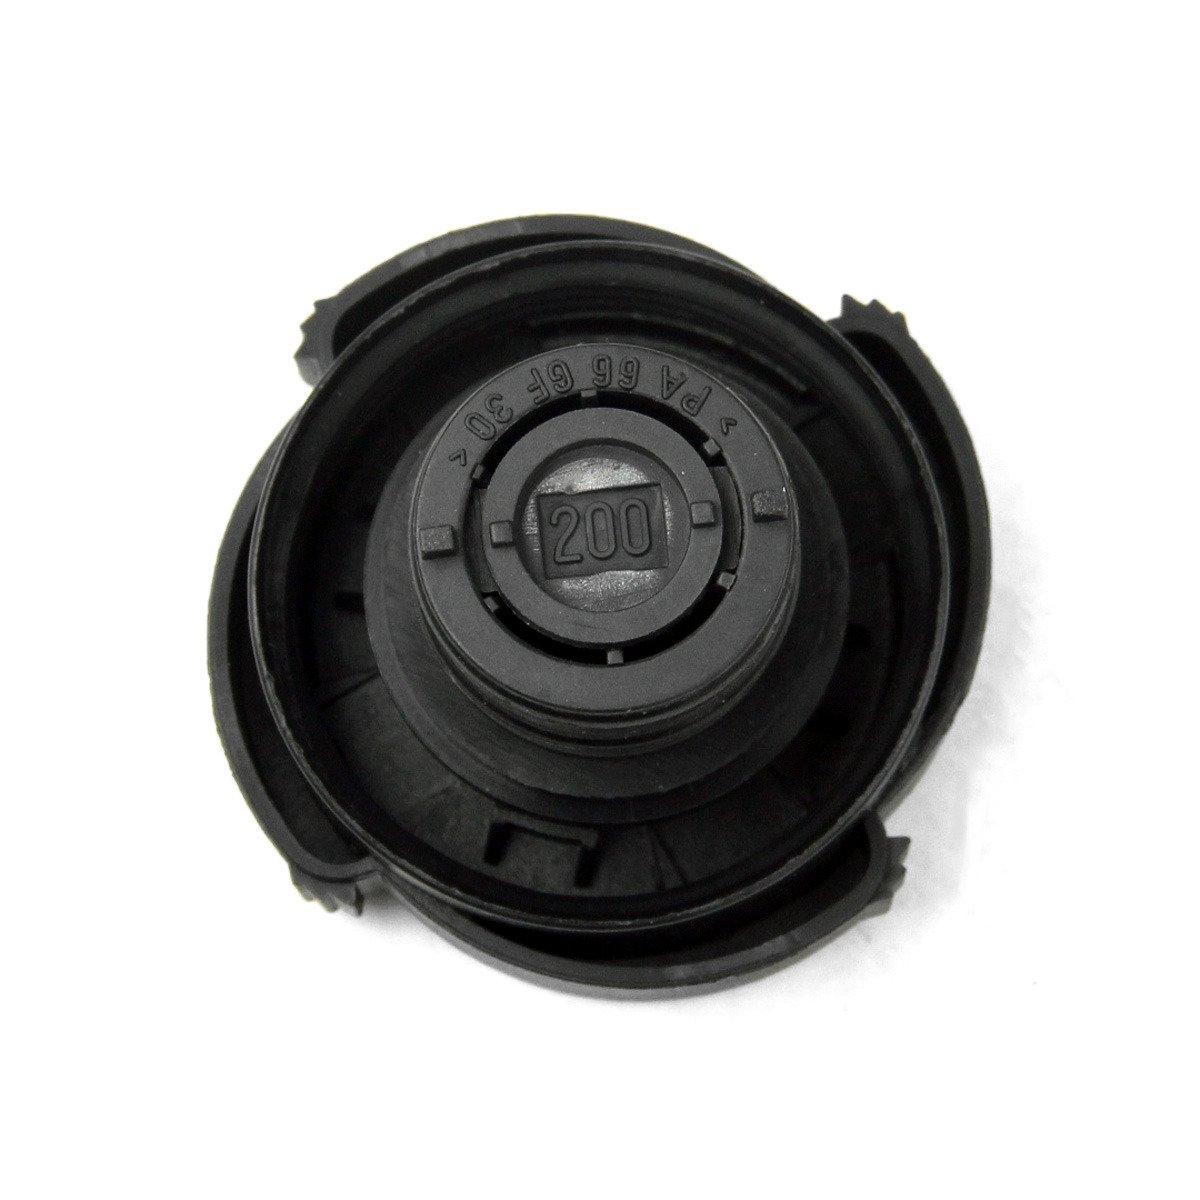 Supeedomotor Tank CAP for E36 E46 3 Series E34 E39 Radiator Rad Expansion CAP 2 Bar Supeedmotor